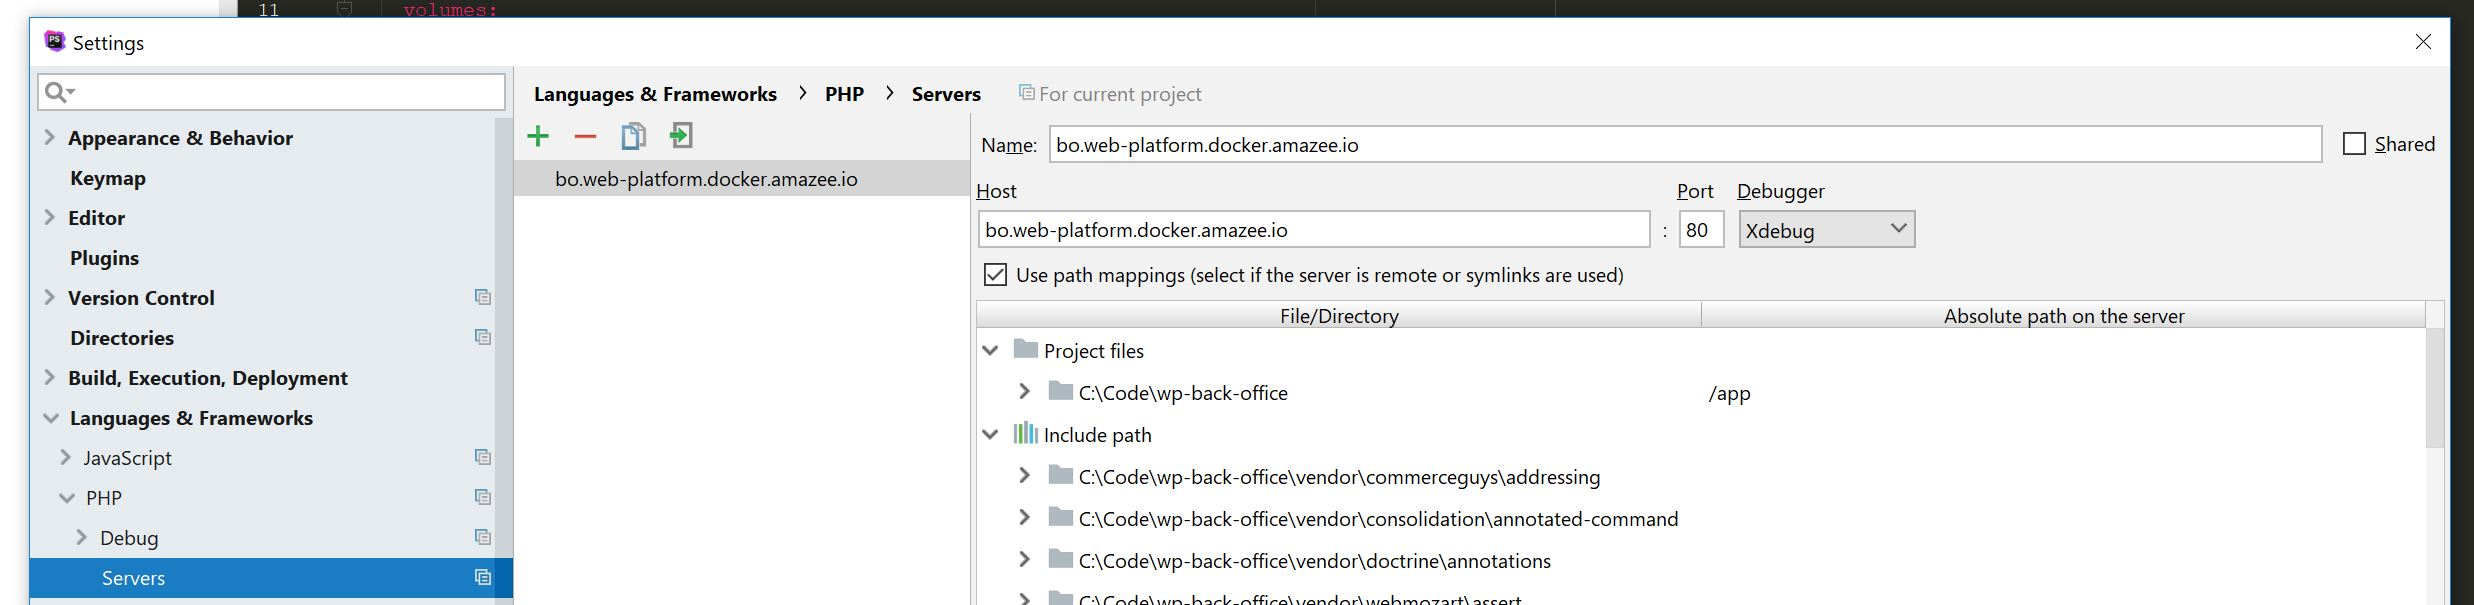 phpstorm_servers